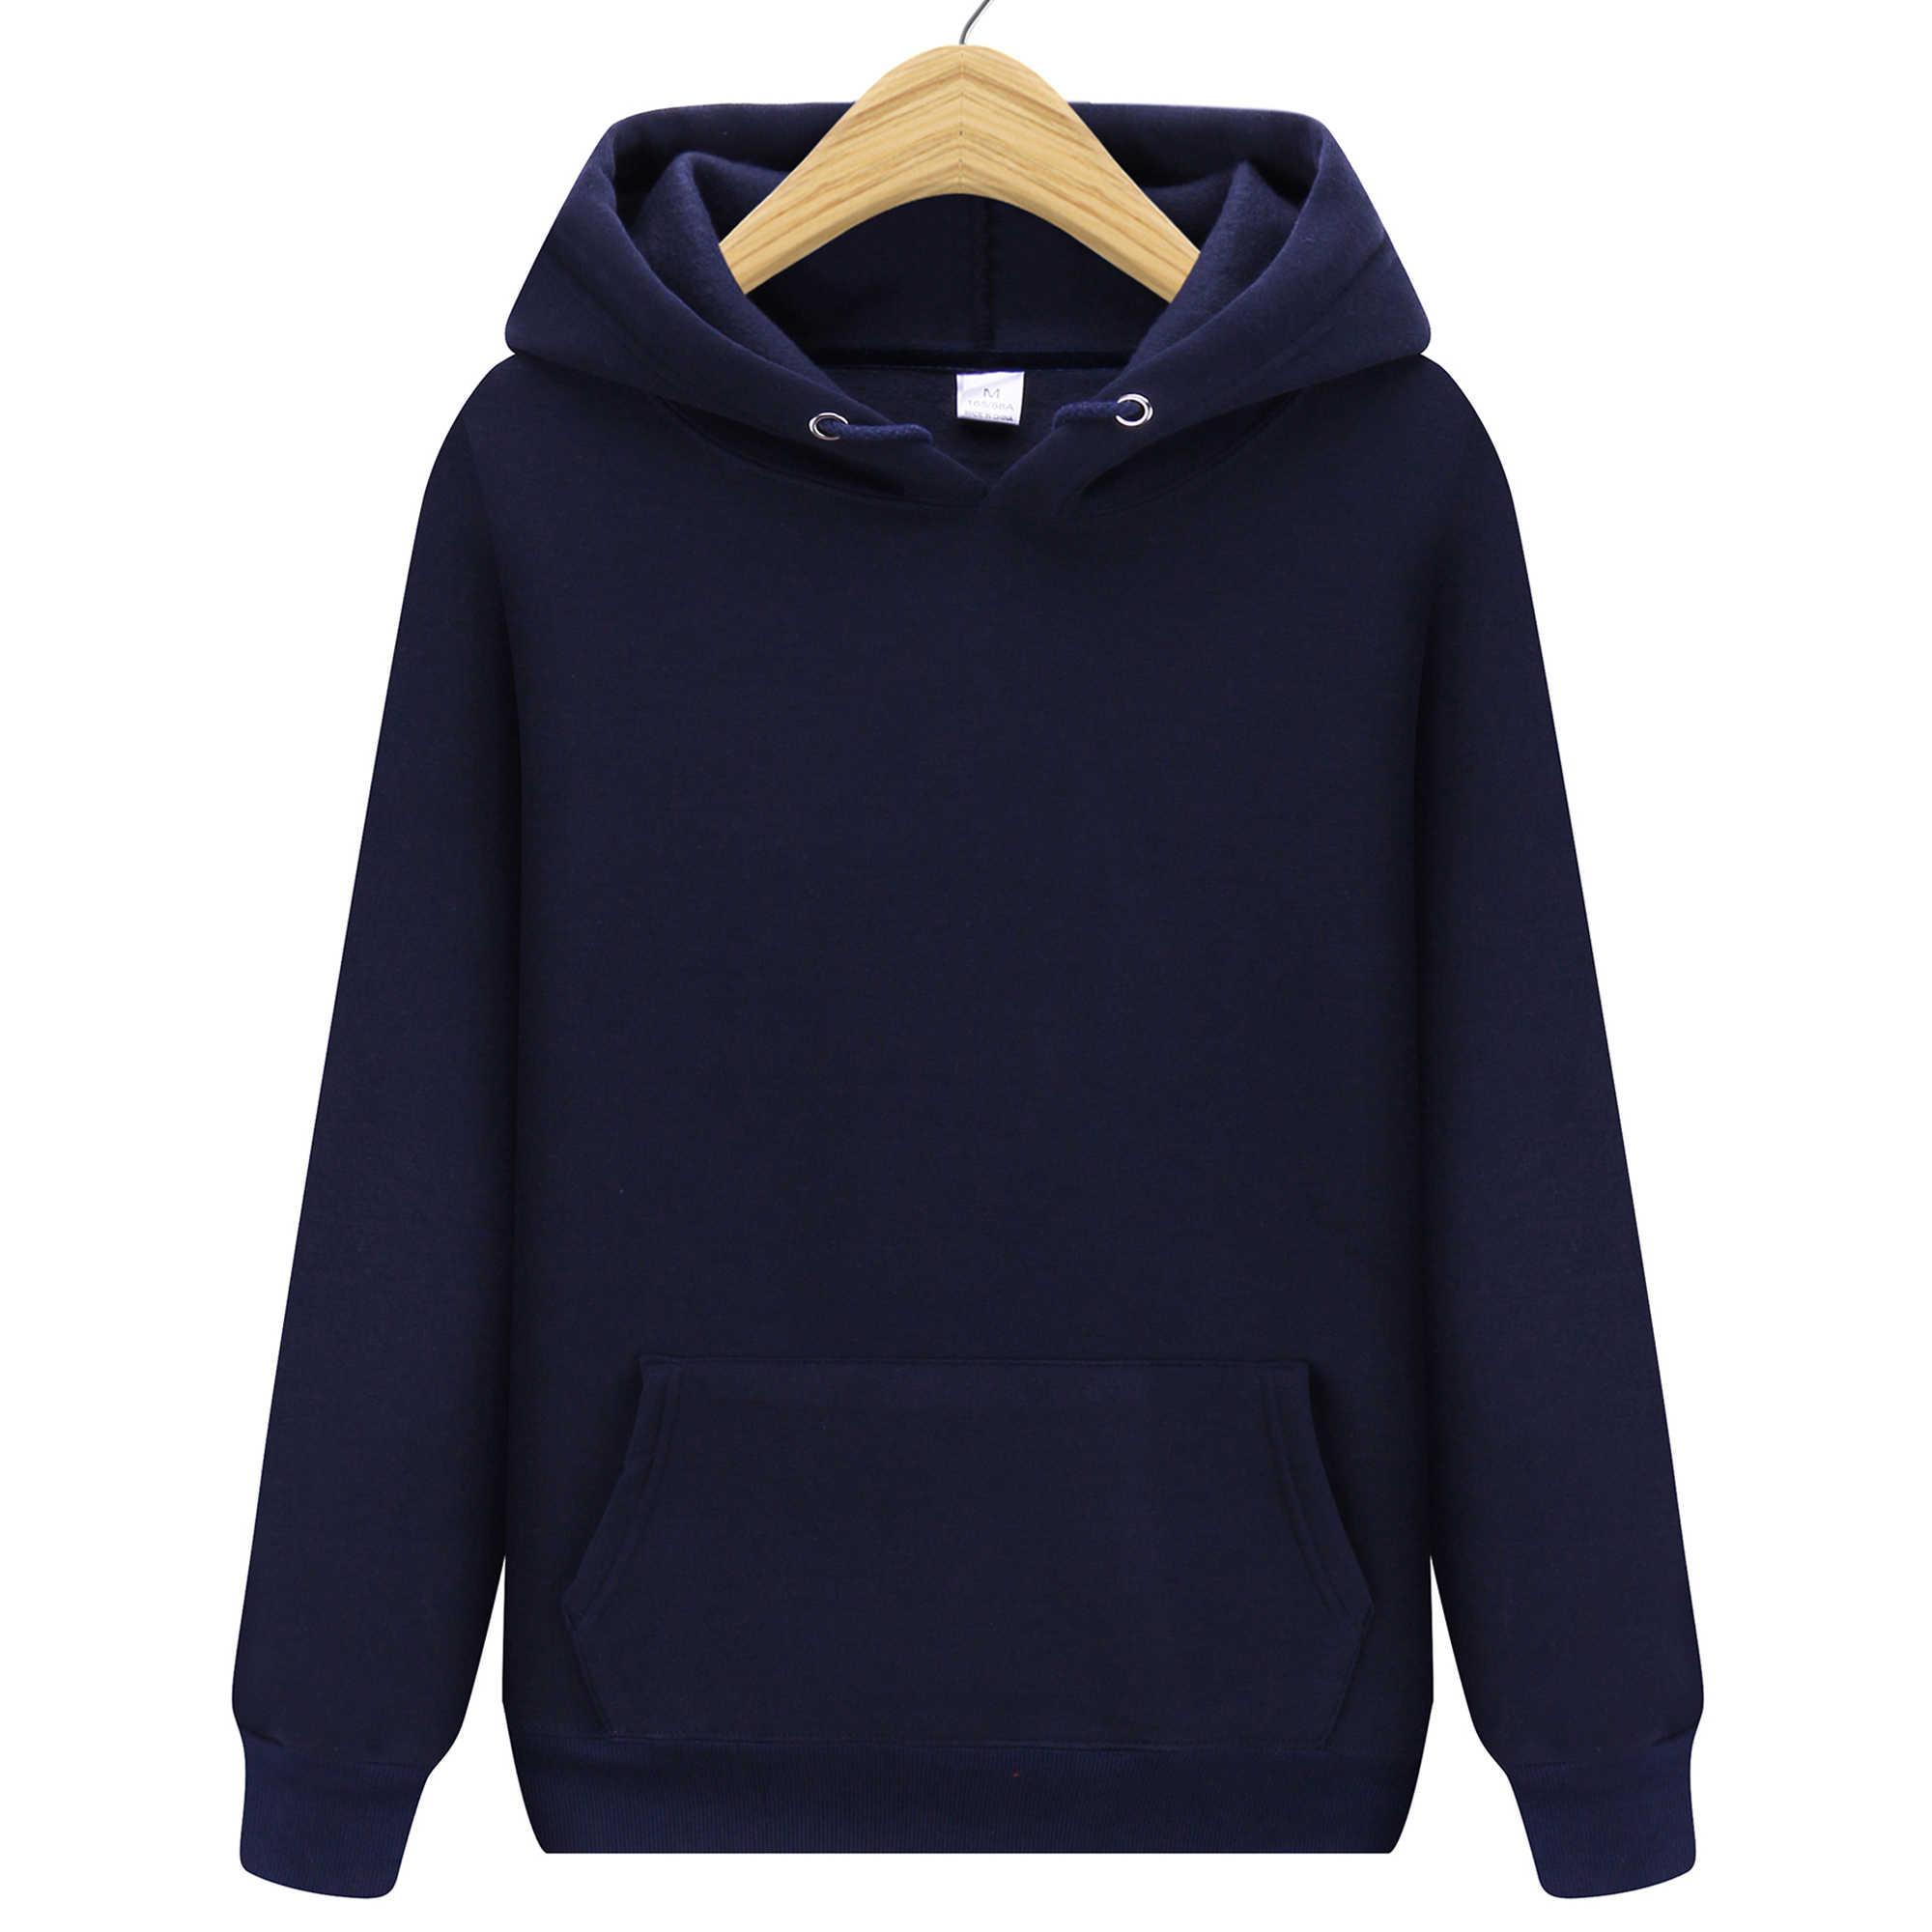 Moda impresso hoodies mulher/homem manga comprida com capuz sweatshirts venda quente casual na moda streetwear hoodies